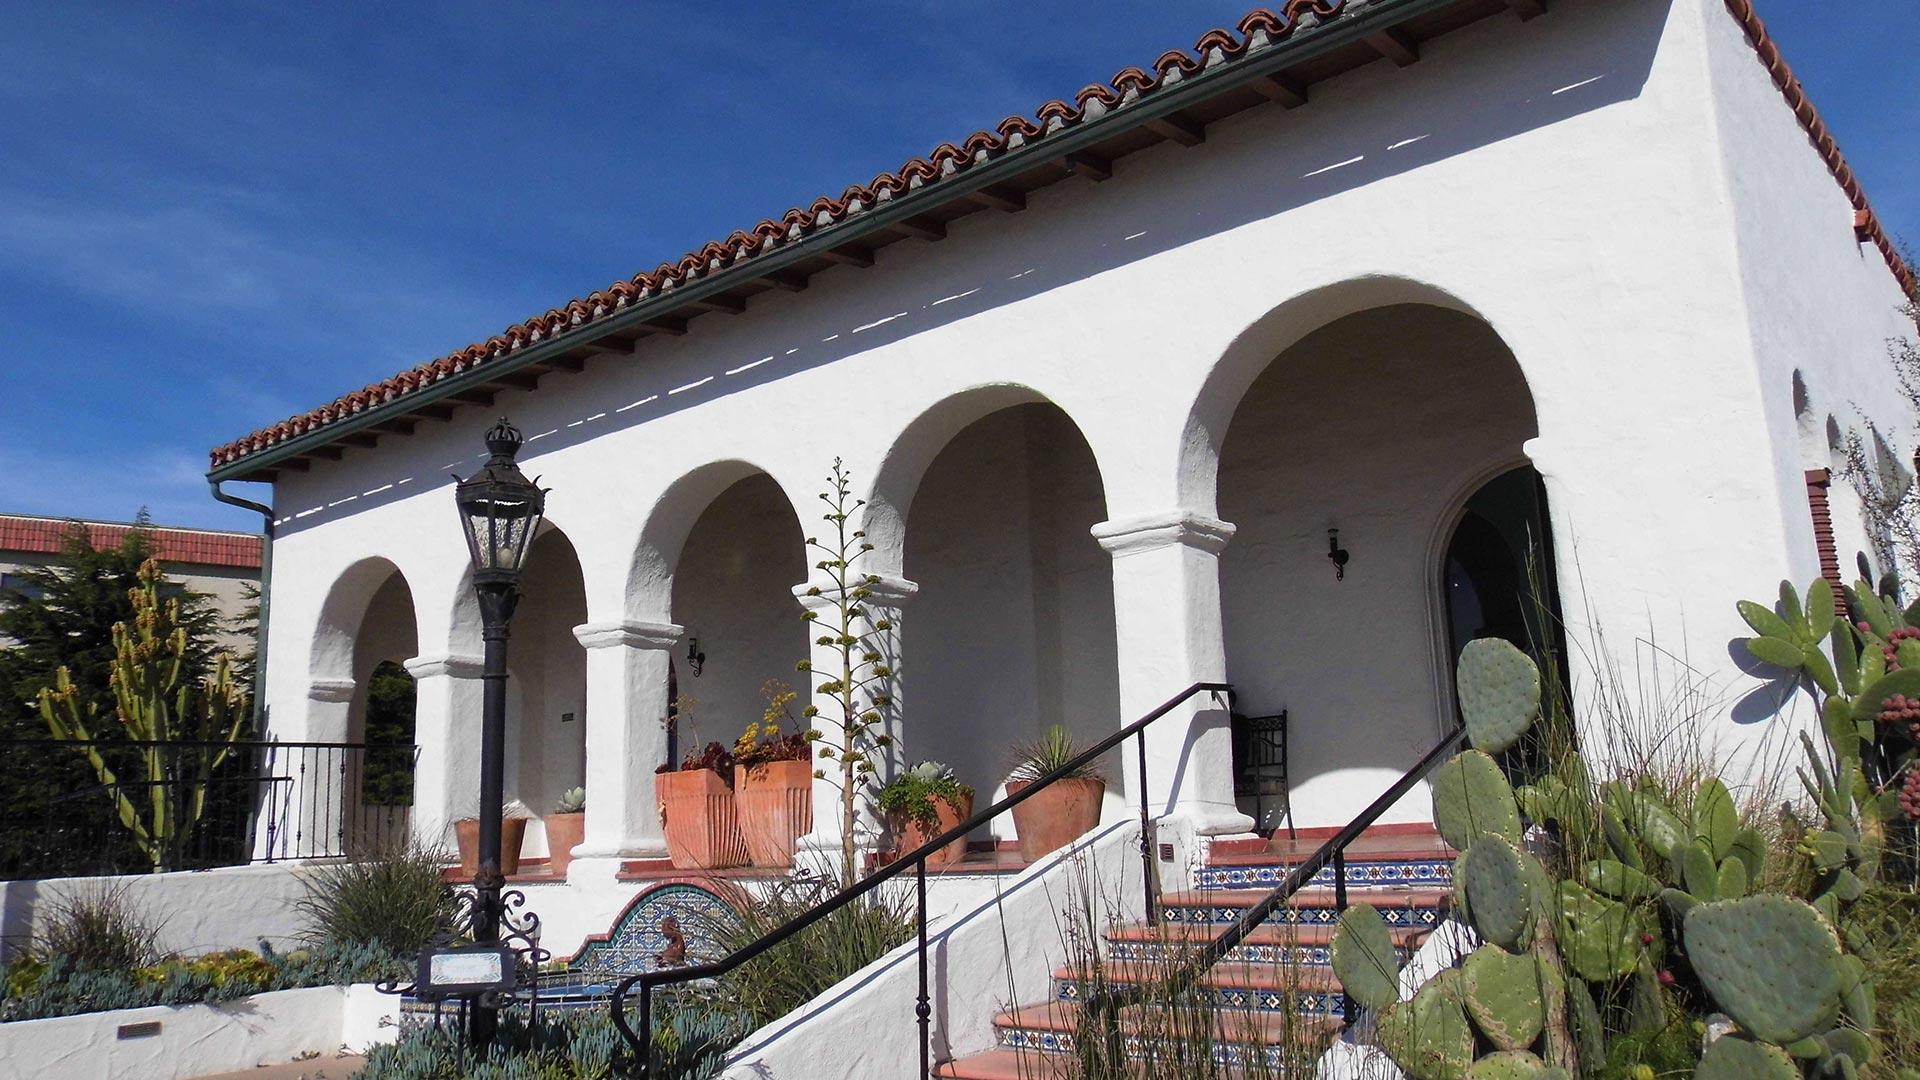 Outdoor view of the Casa Romantica Cultural Center.